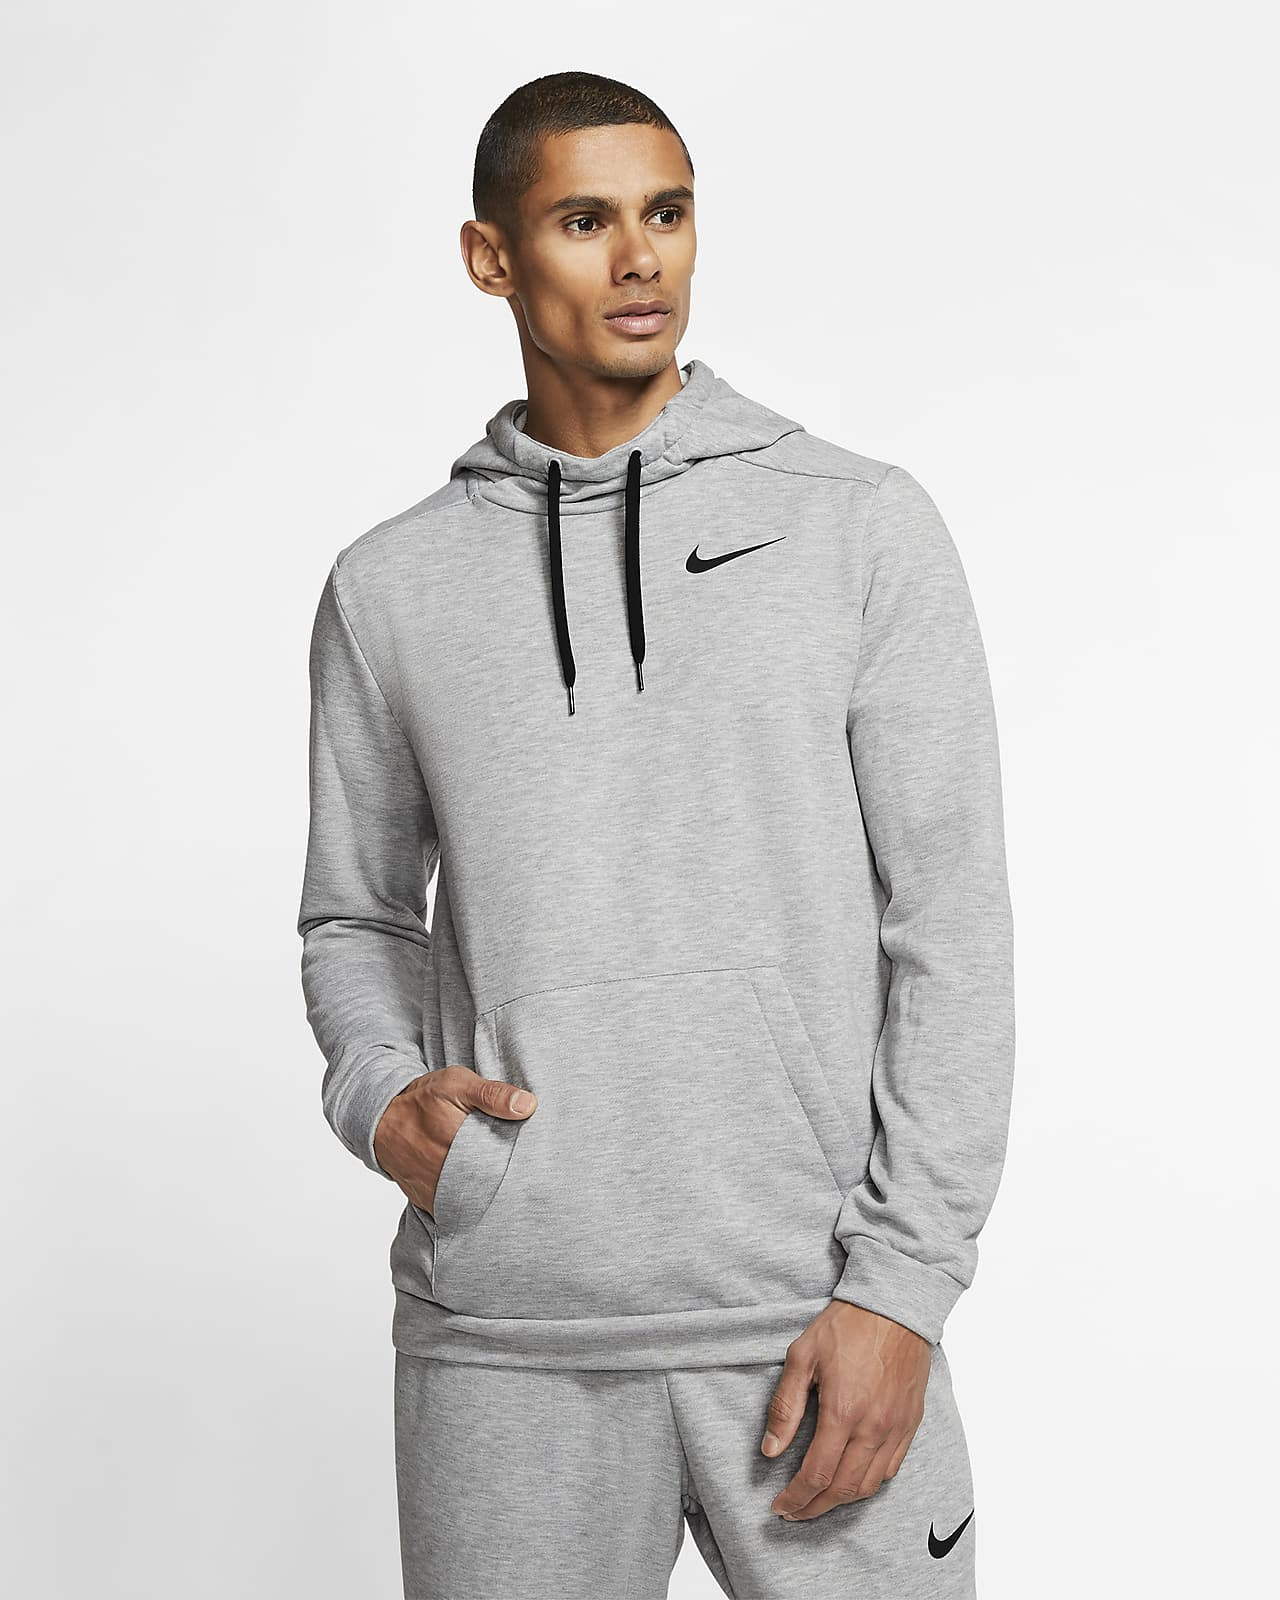 Cambiarse de ropa ojo Soleado  Nike Dri-FIT Men's Pullover Training Hoodie. Nike.com